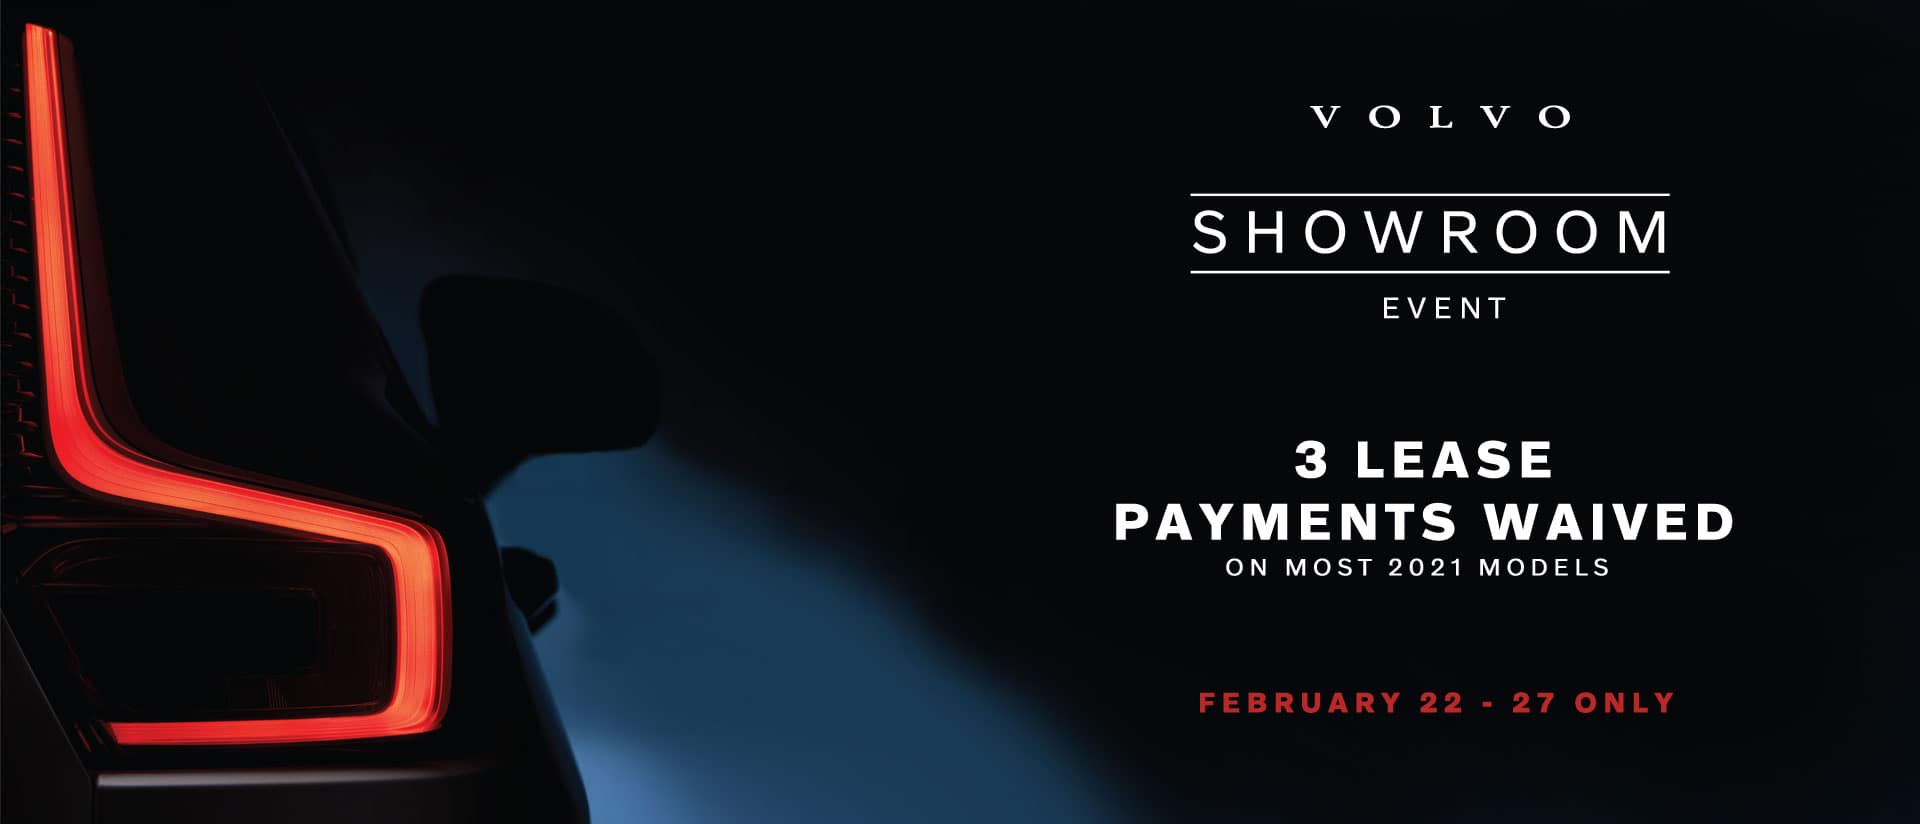 Volvo_Showroom2021